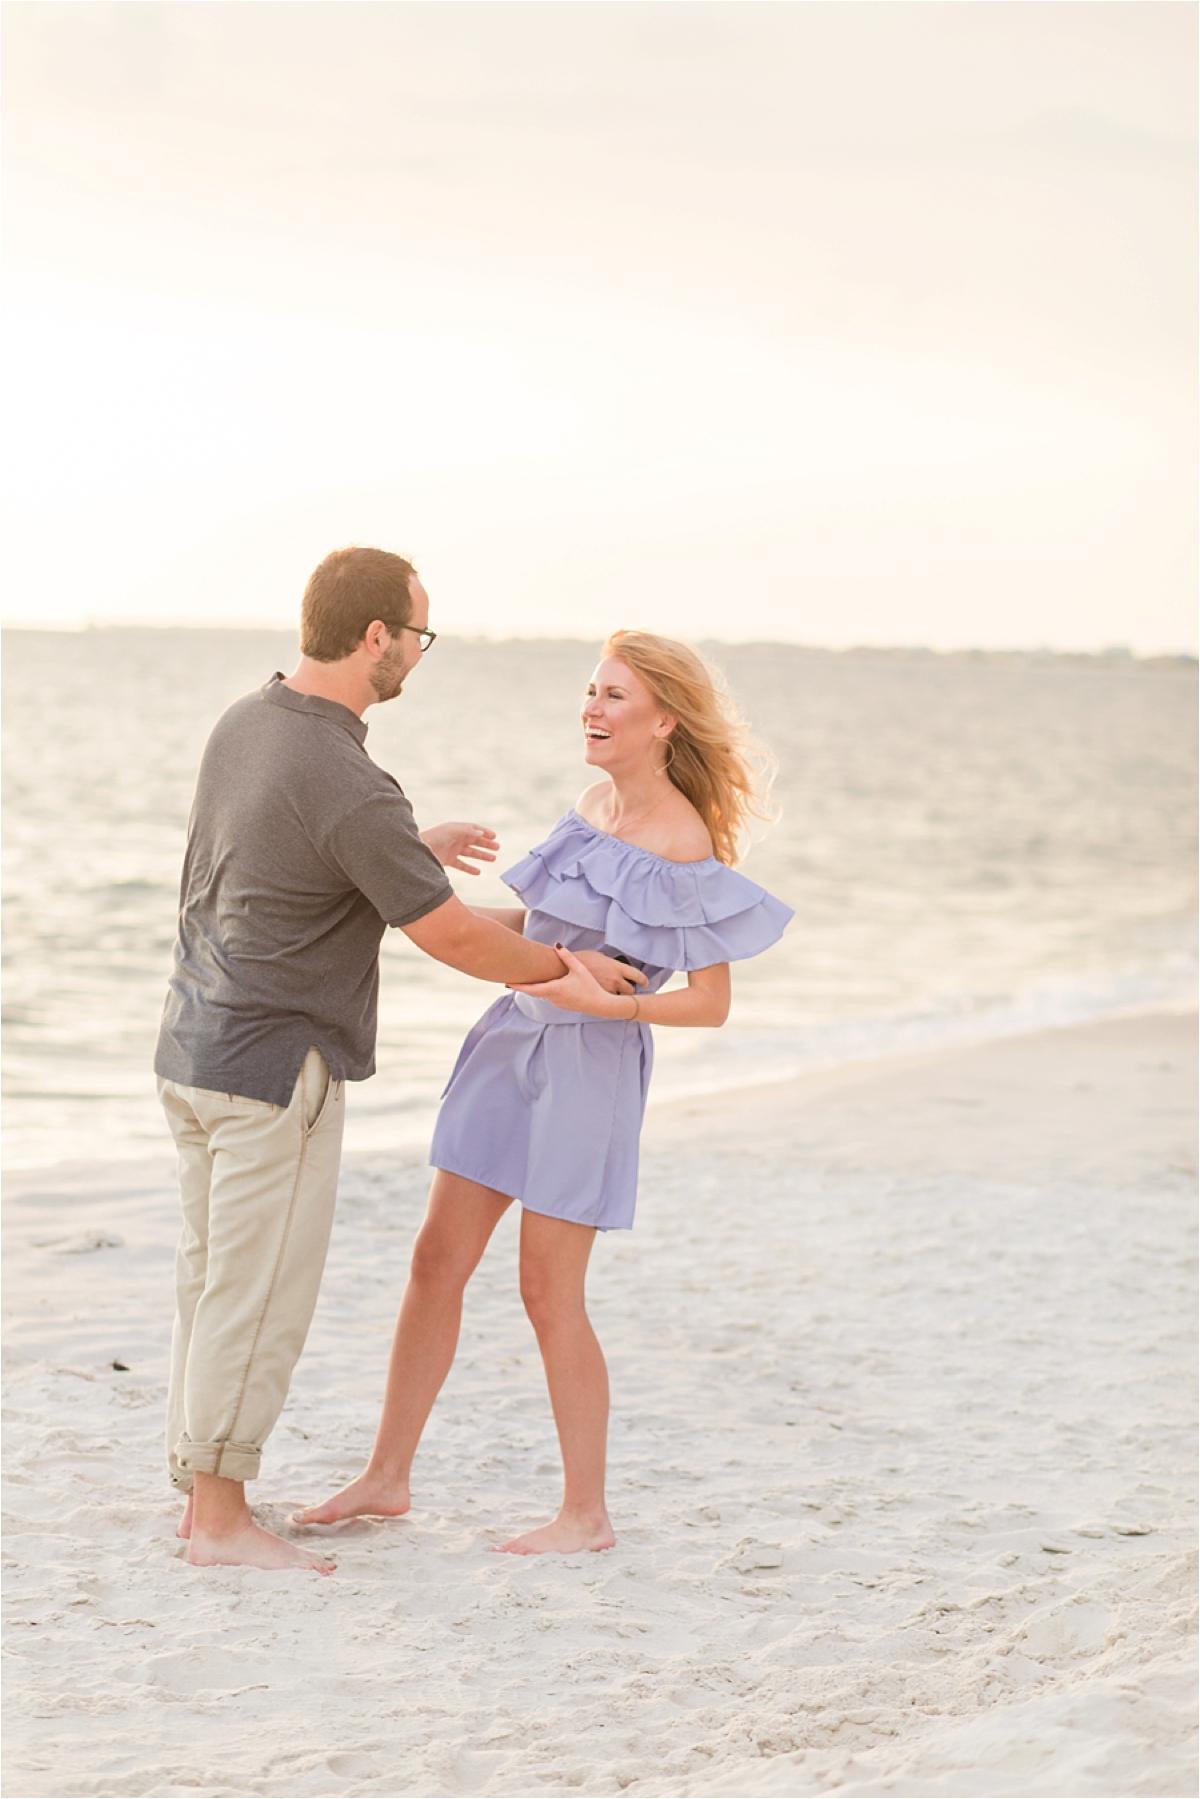 Dauphin Island Proposal at Sunset-Clay + Lauren-Beach proposal-Beach engagement-Alabama photographer